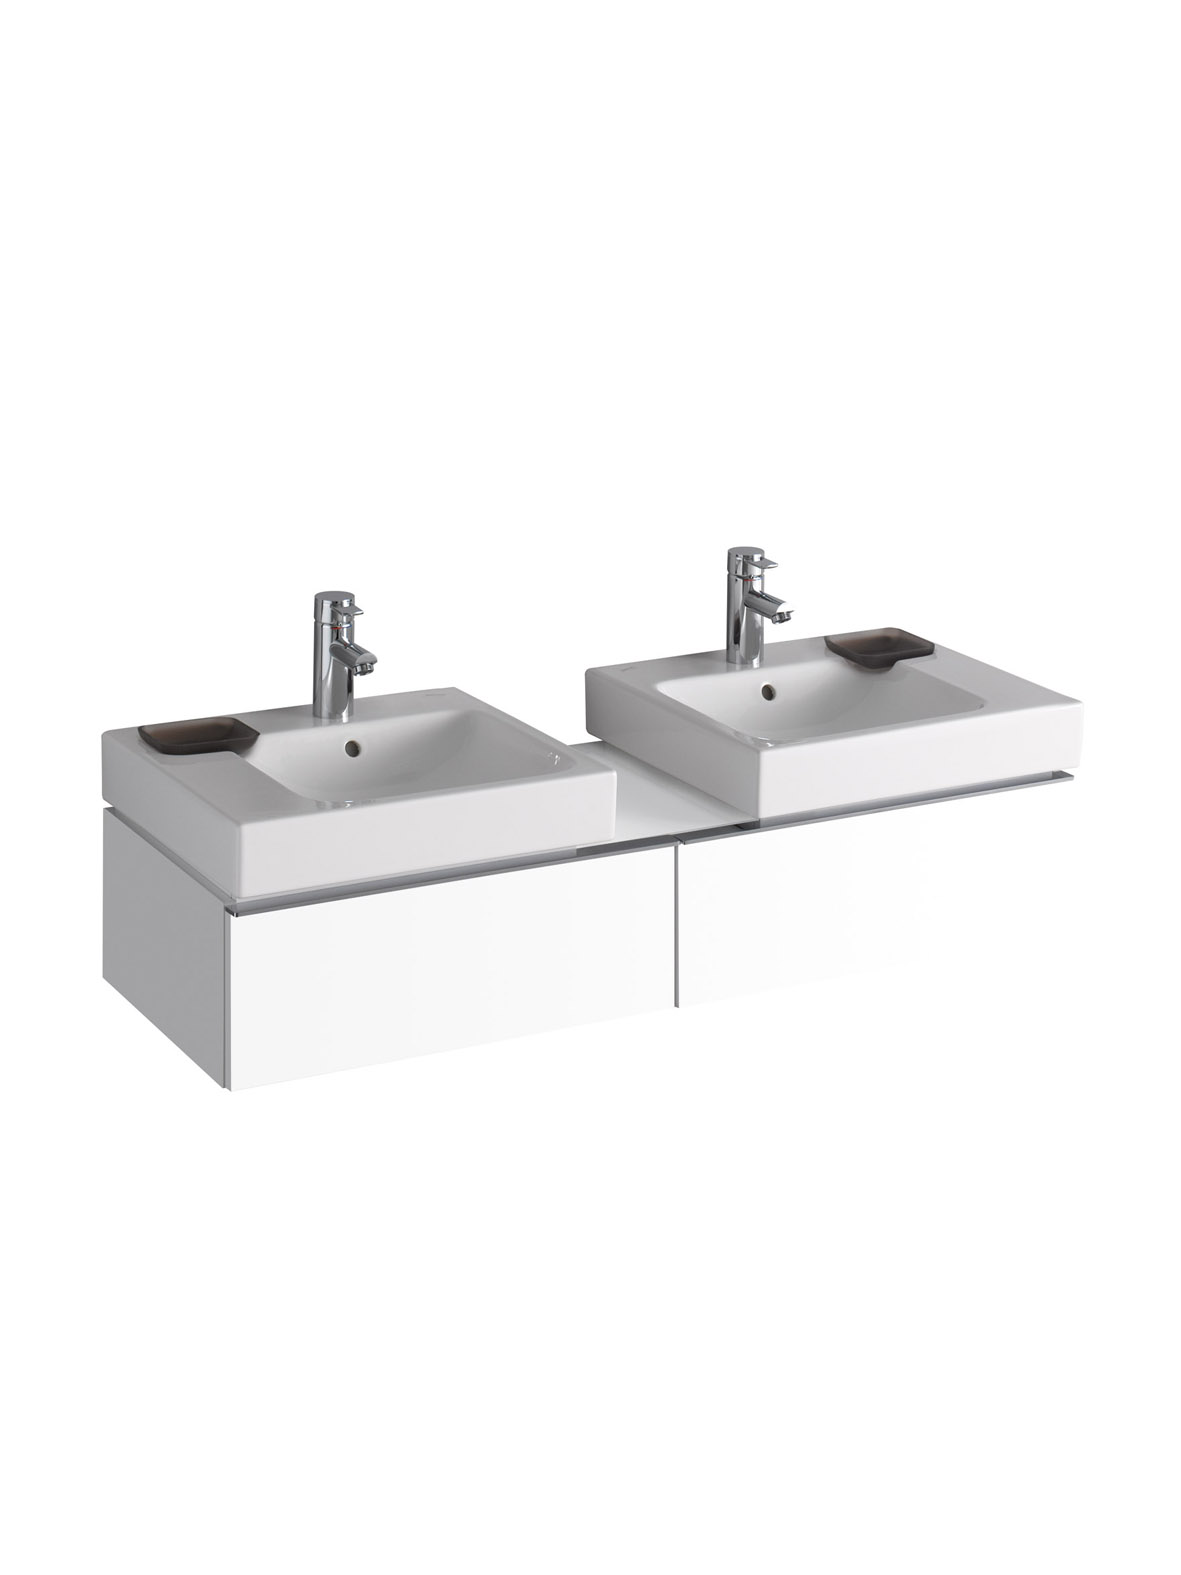 koupelnový nábytek KERAMAG Icon levá+pravá bílá